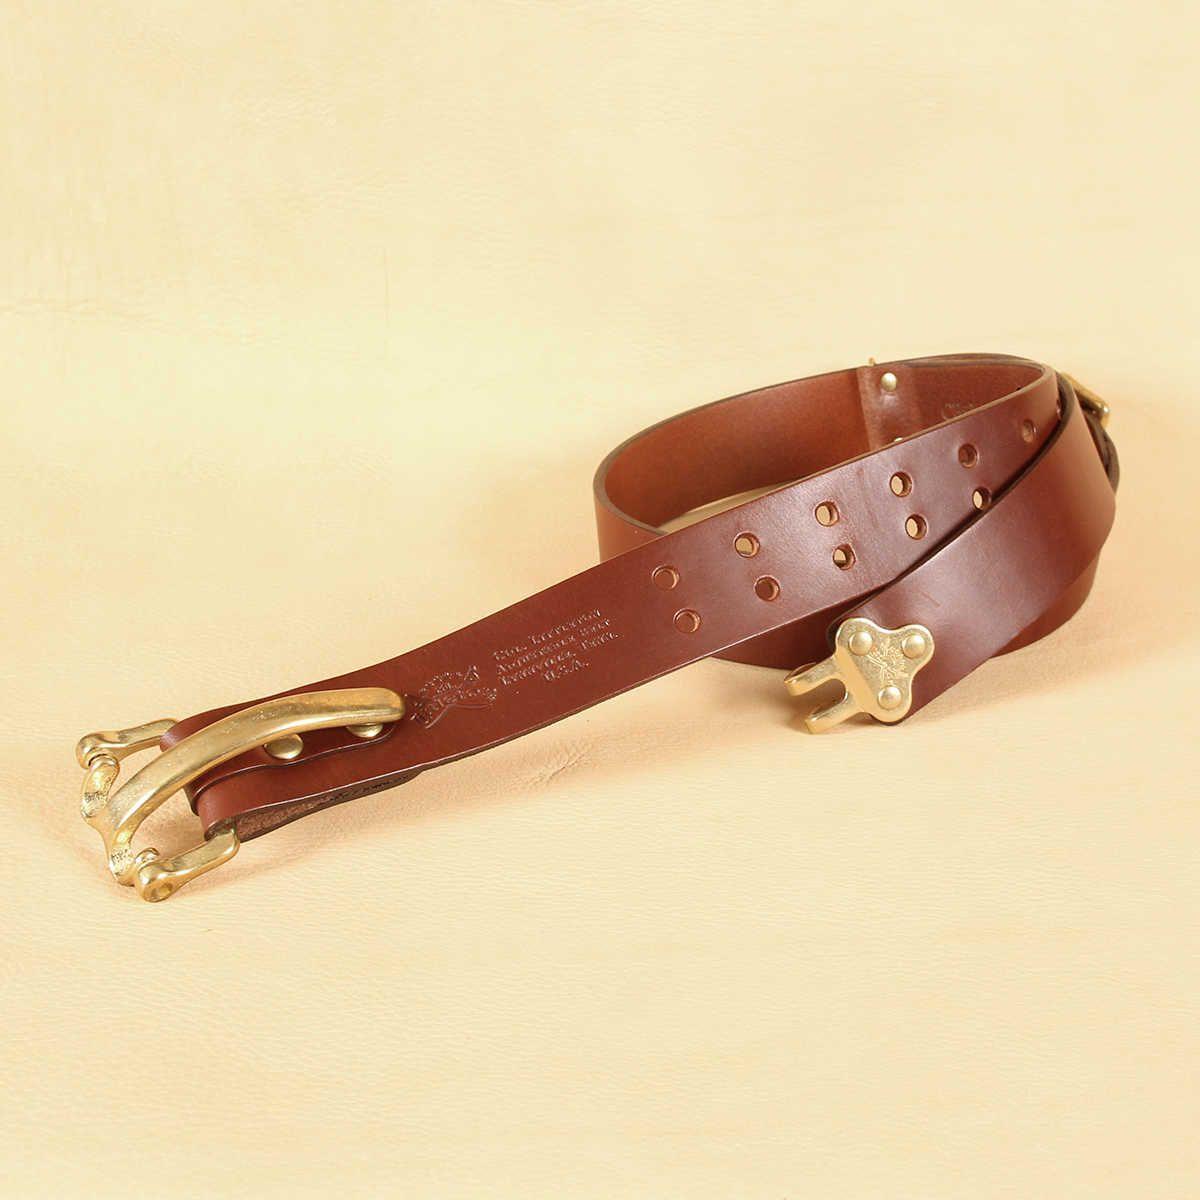 Handmade Leather Cinch Belt No 5 Adjustable Usa Made Col Littleton Kemer